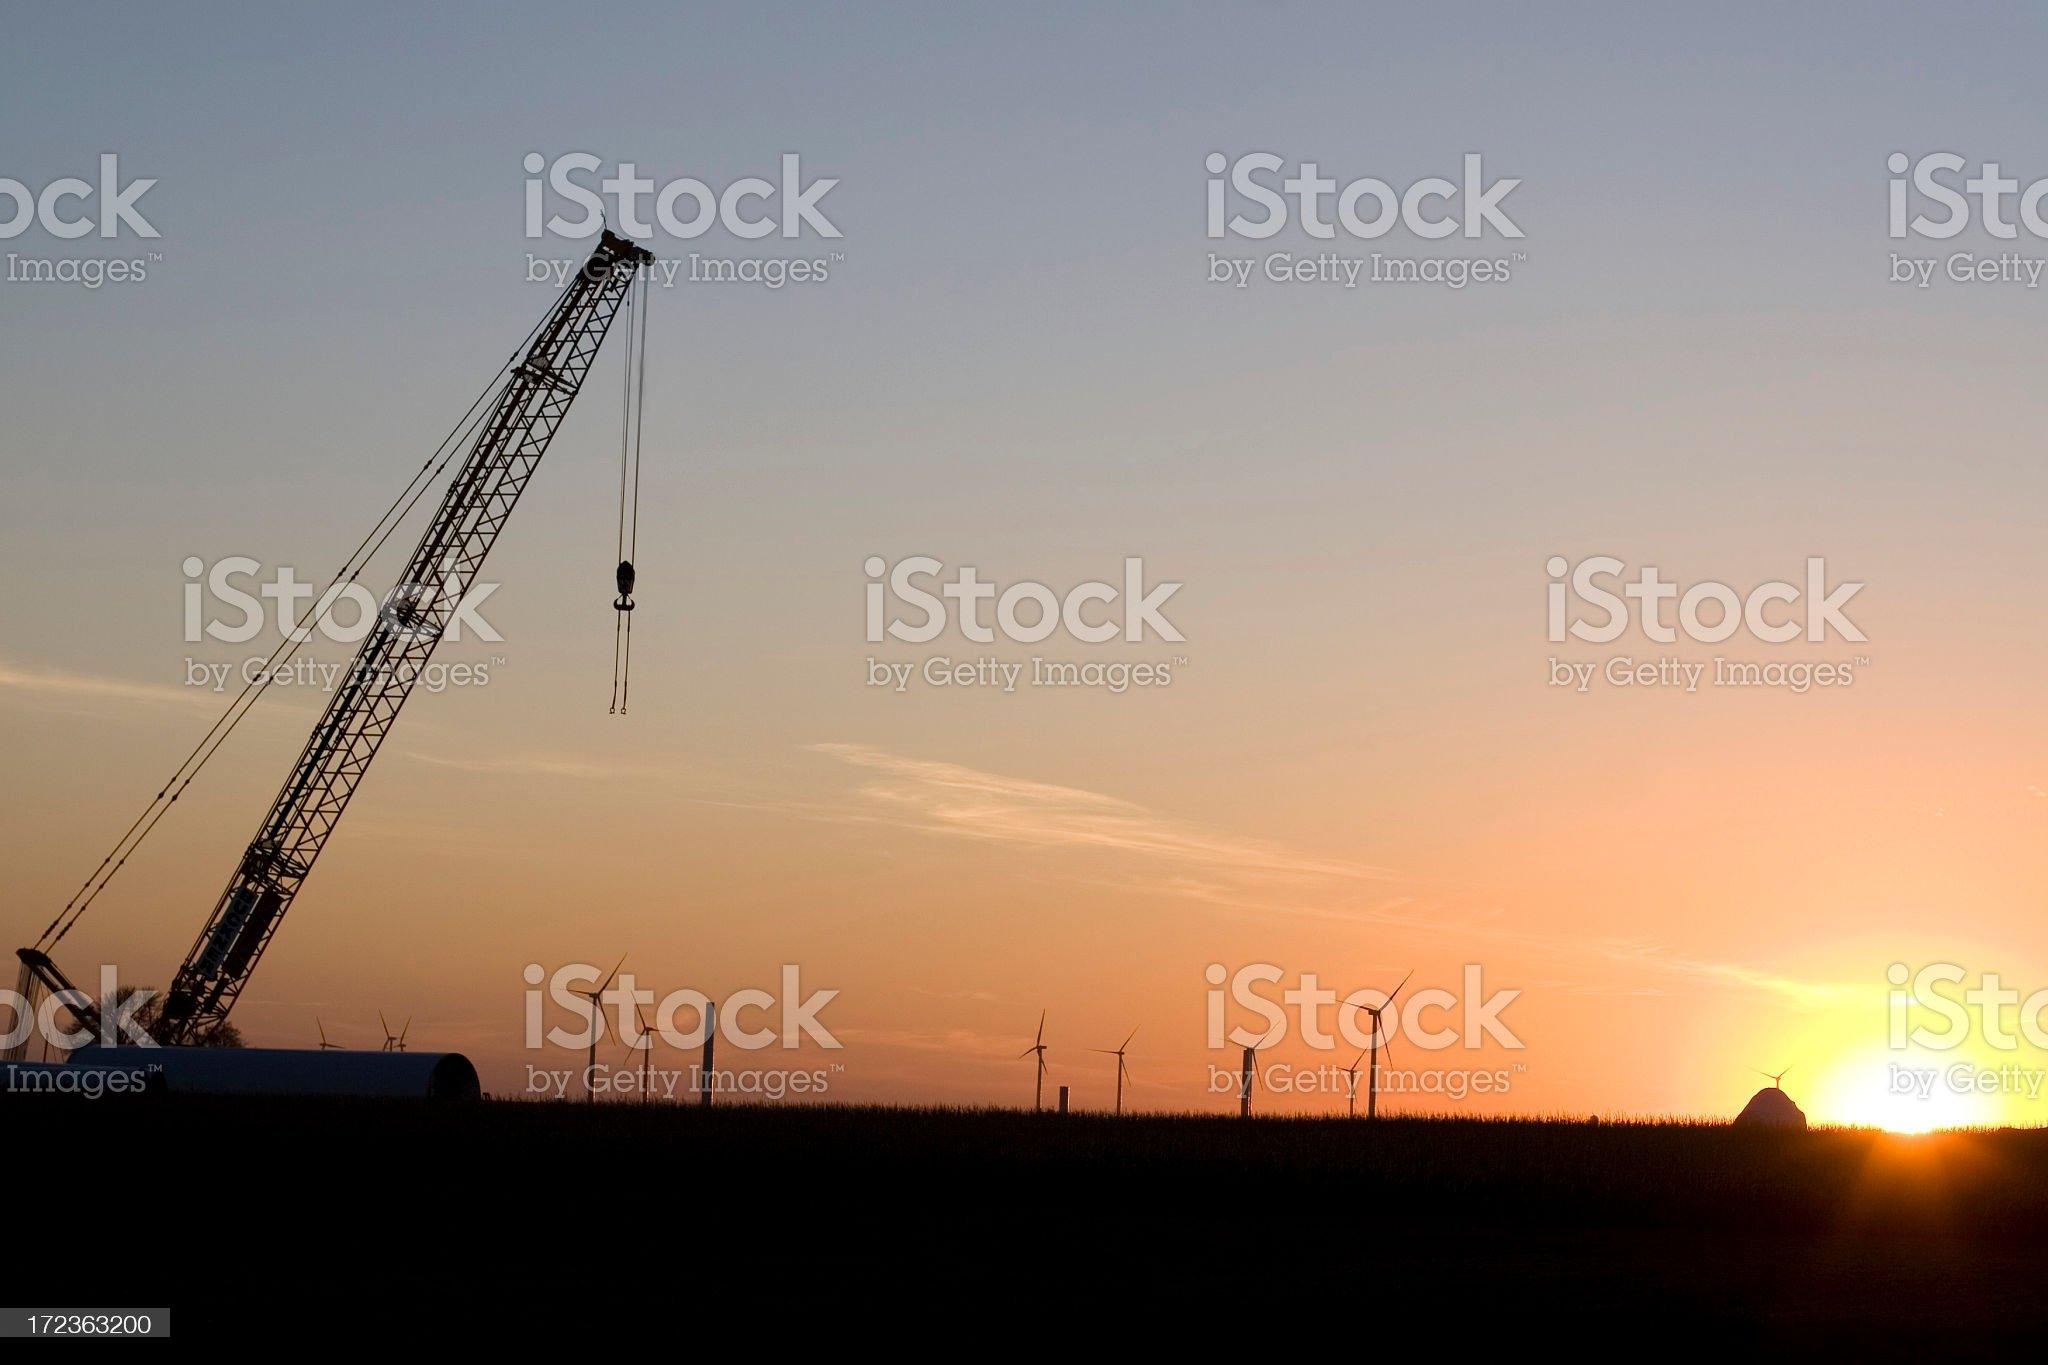 Wind Turbine Construction Site royalty-free stock photo